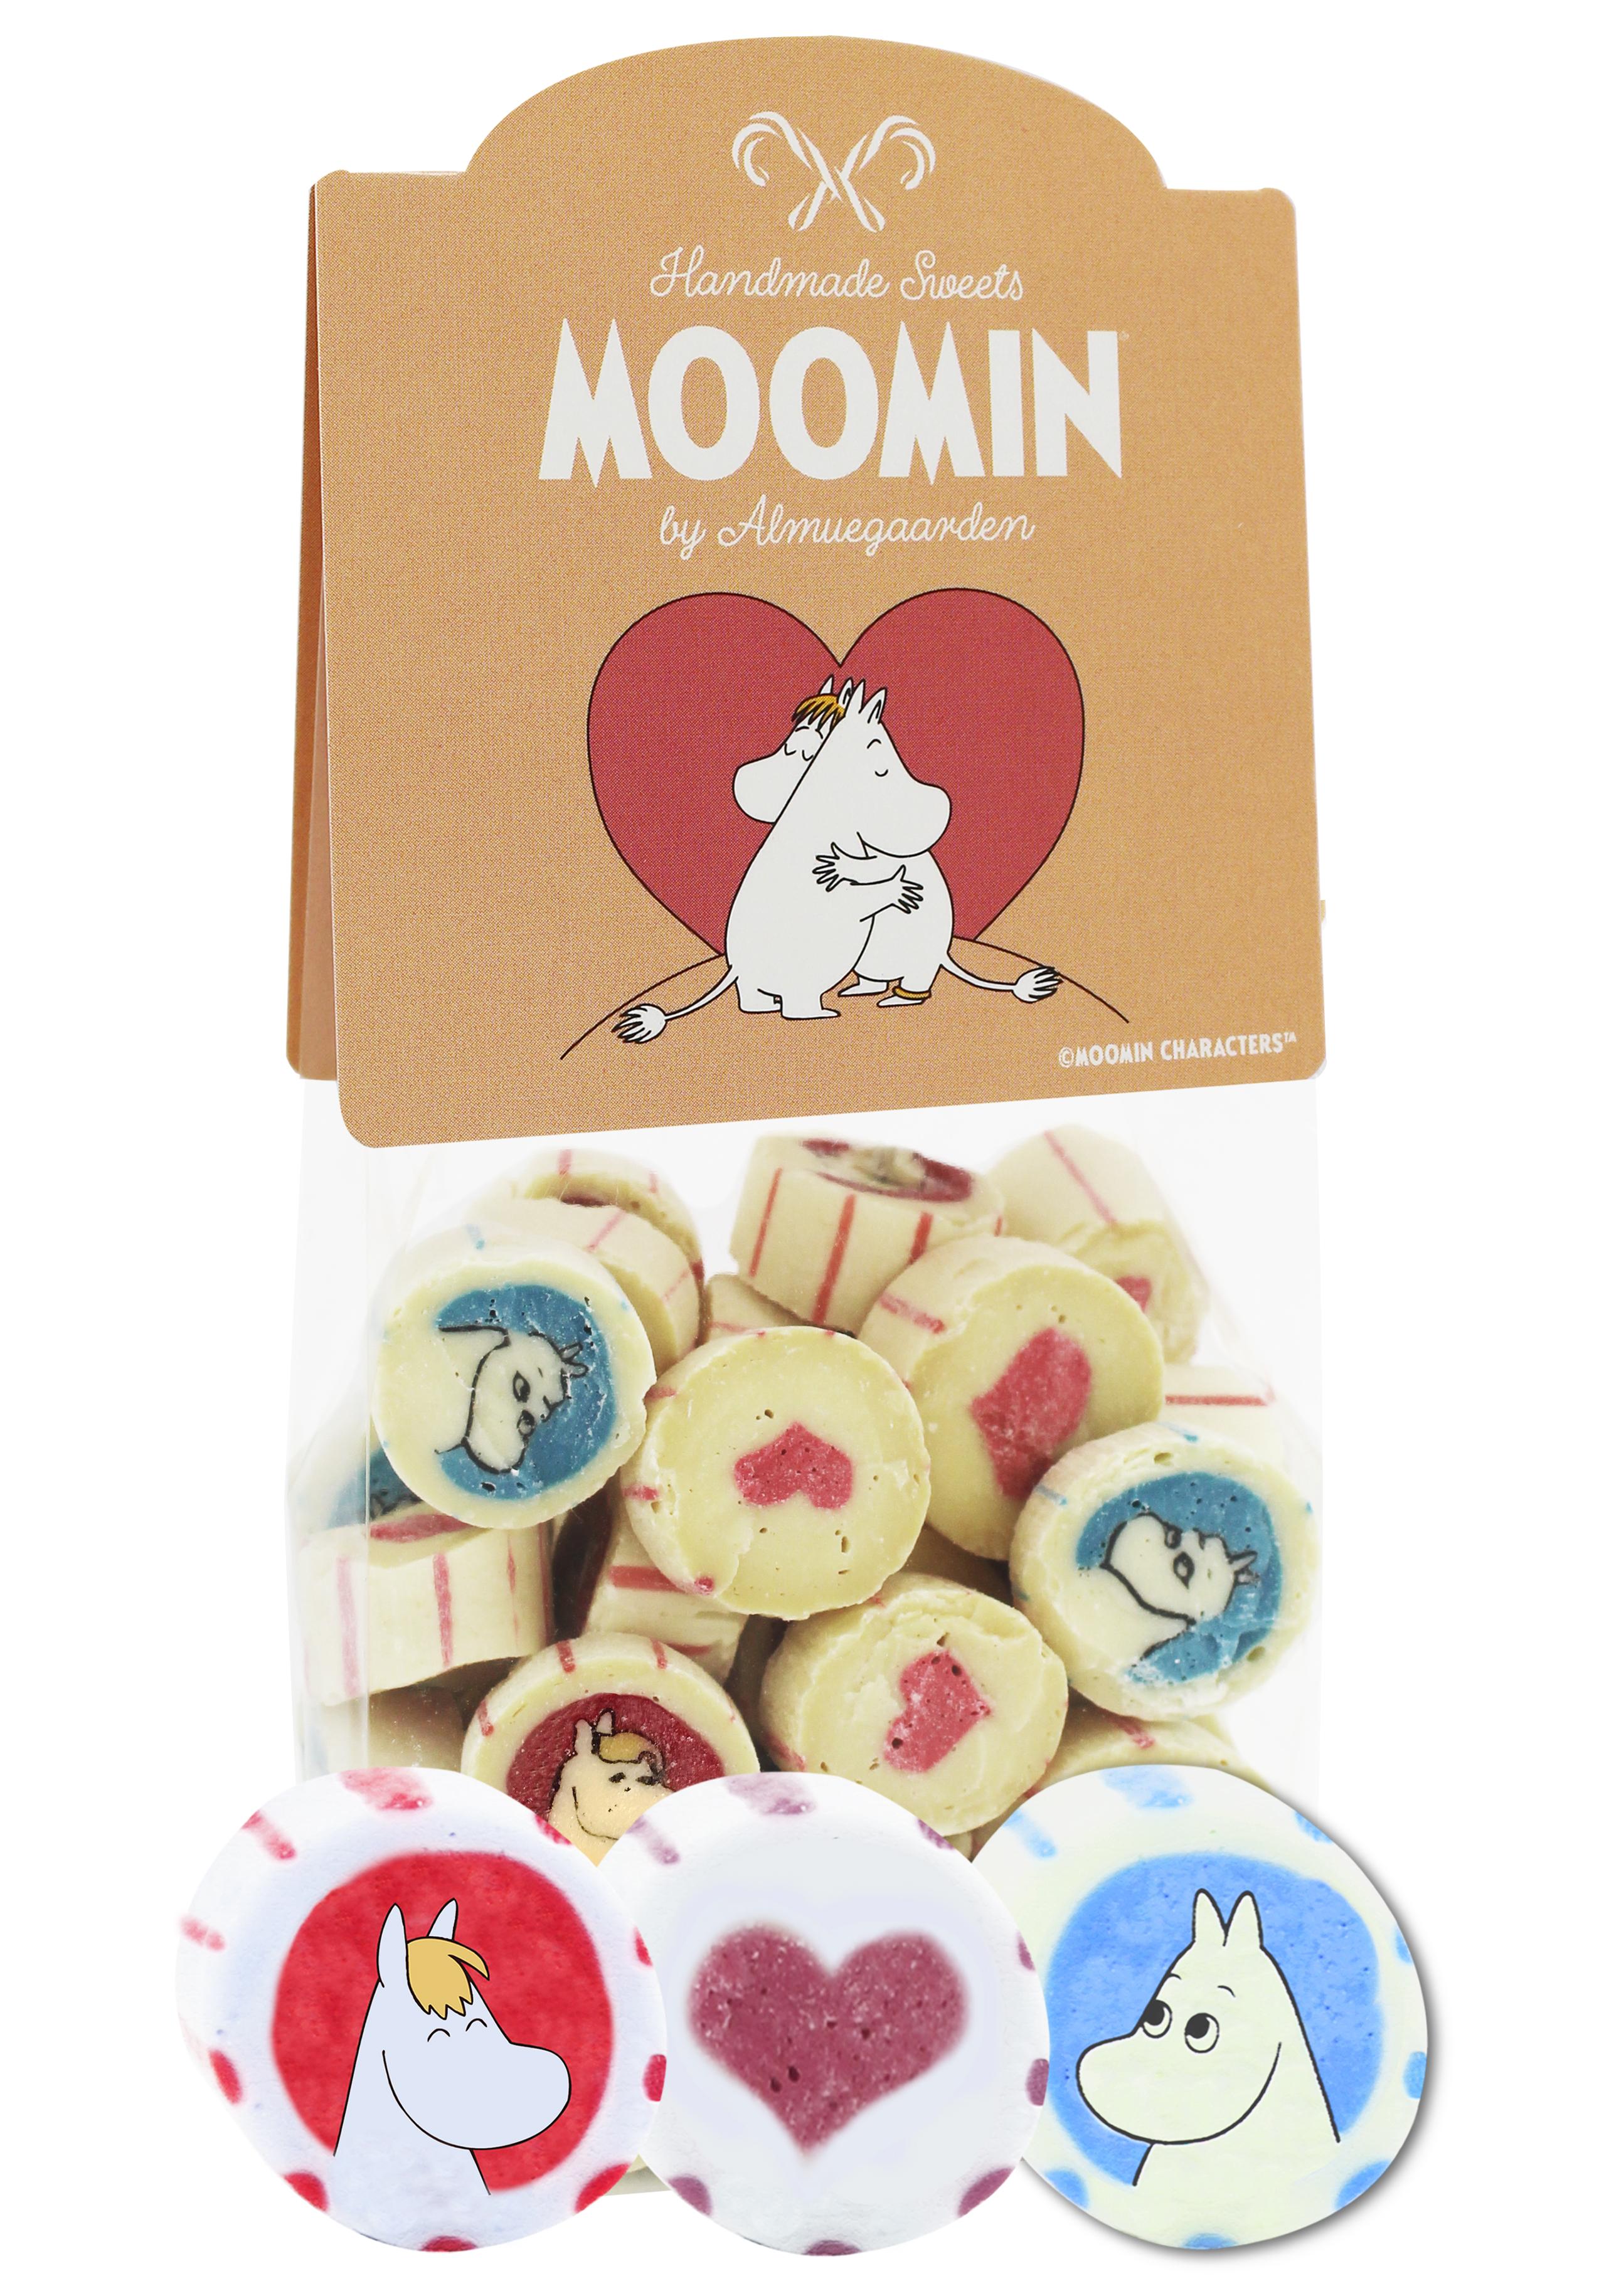 MOOMIN by Almuegaarden - Moomin Love Sweets